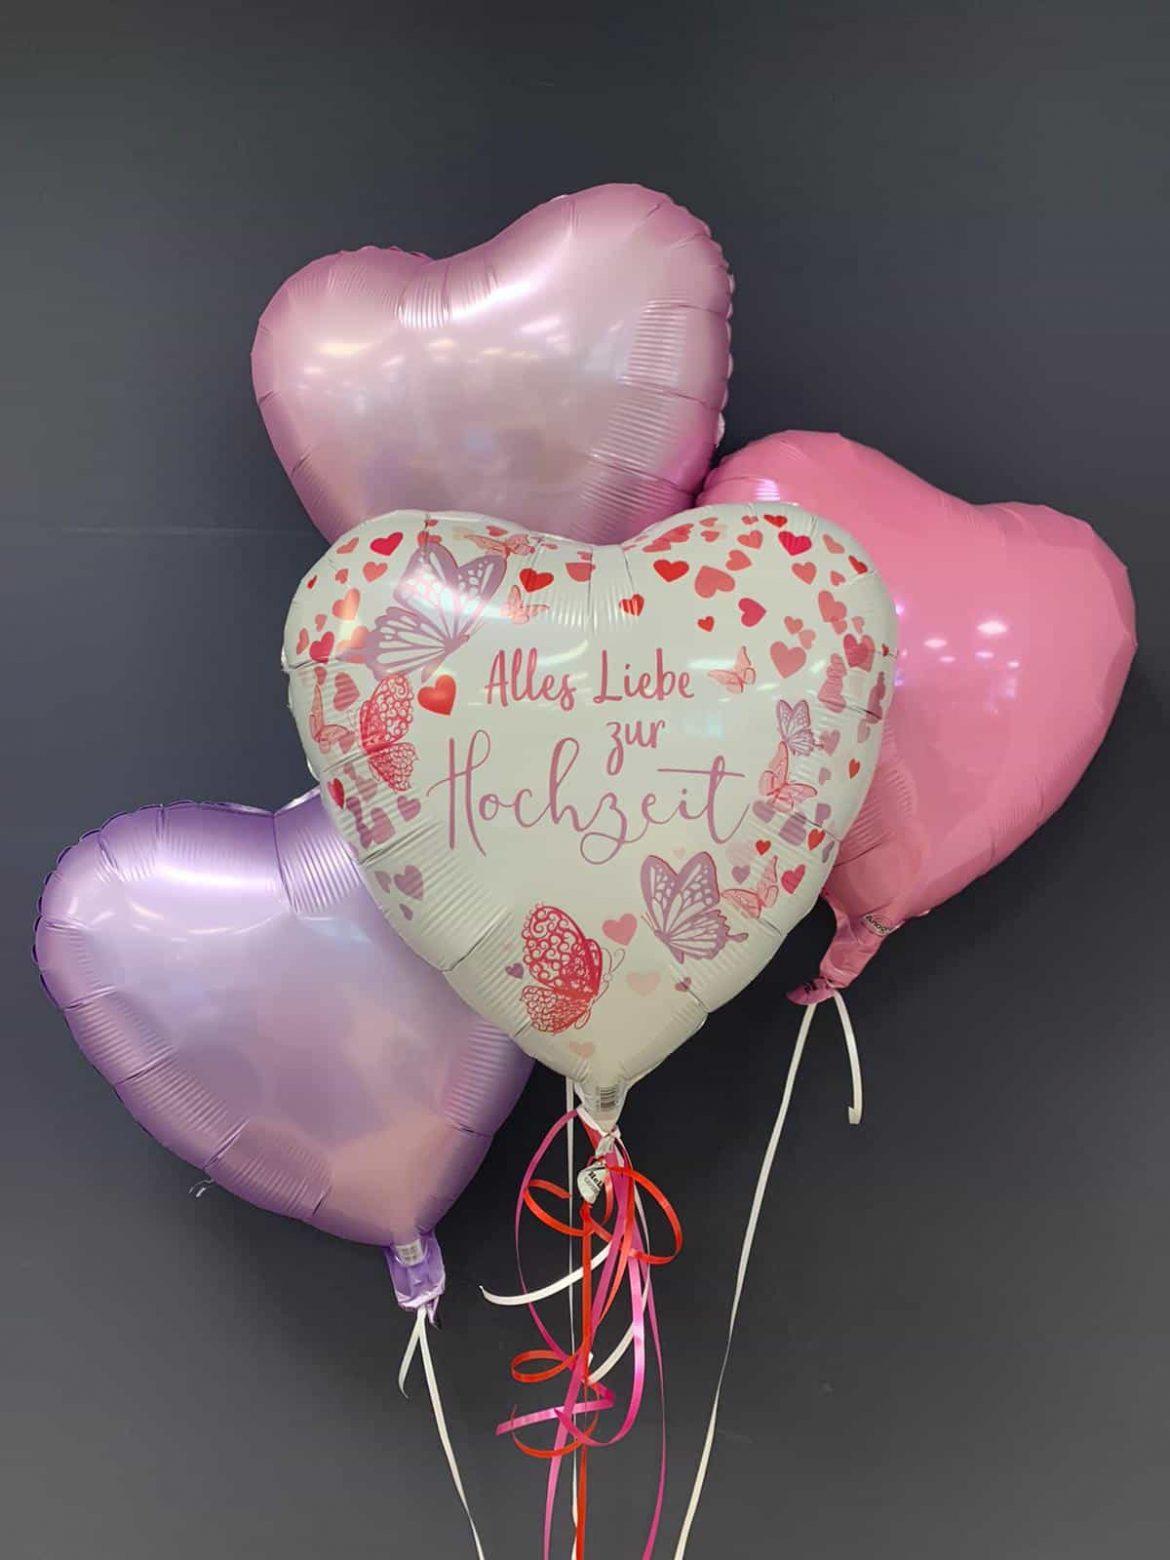 Hochzeitsballon € 5,90<br />Dekoballon €4,50 1